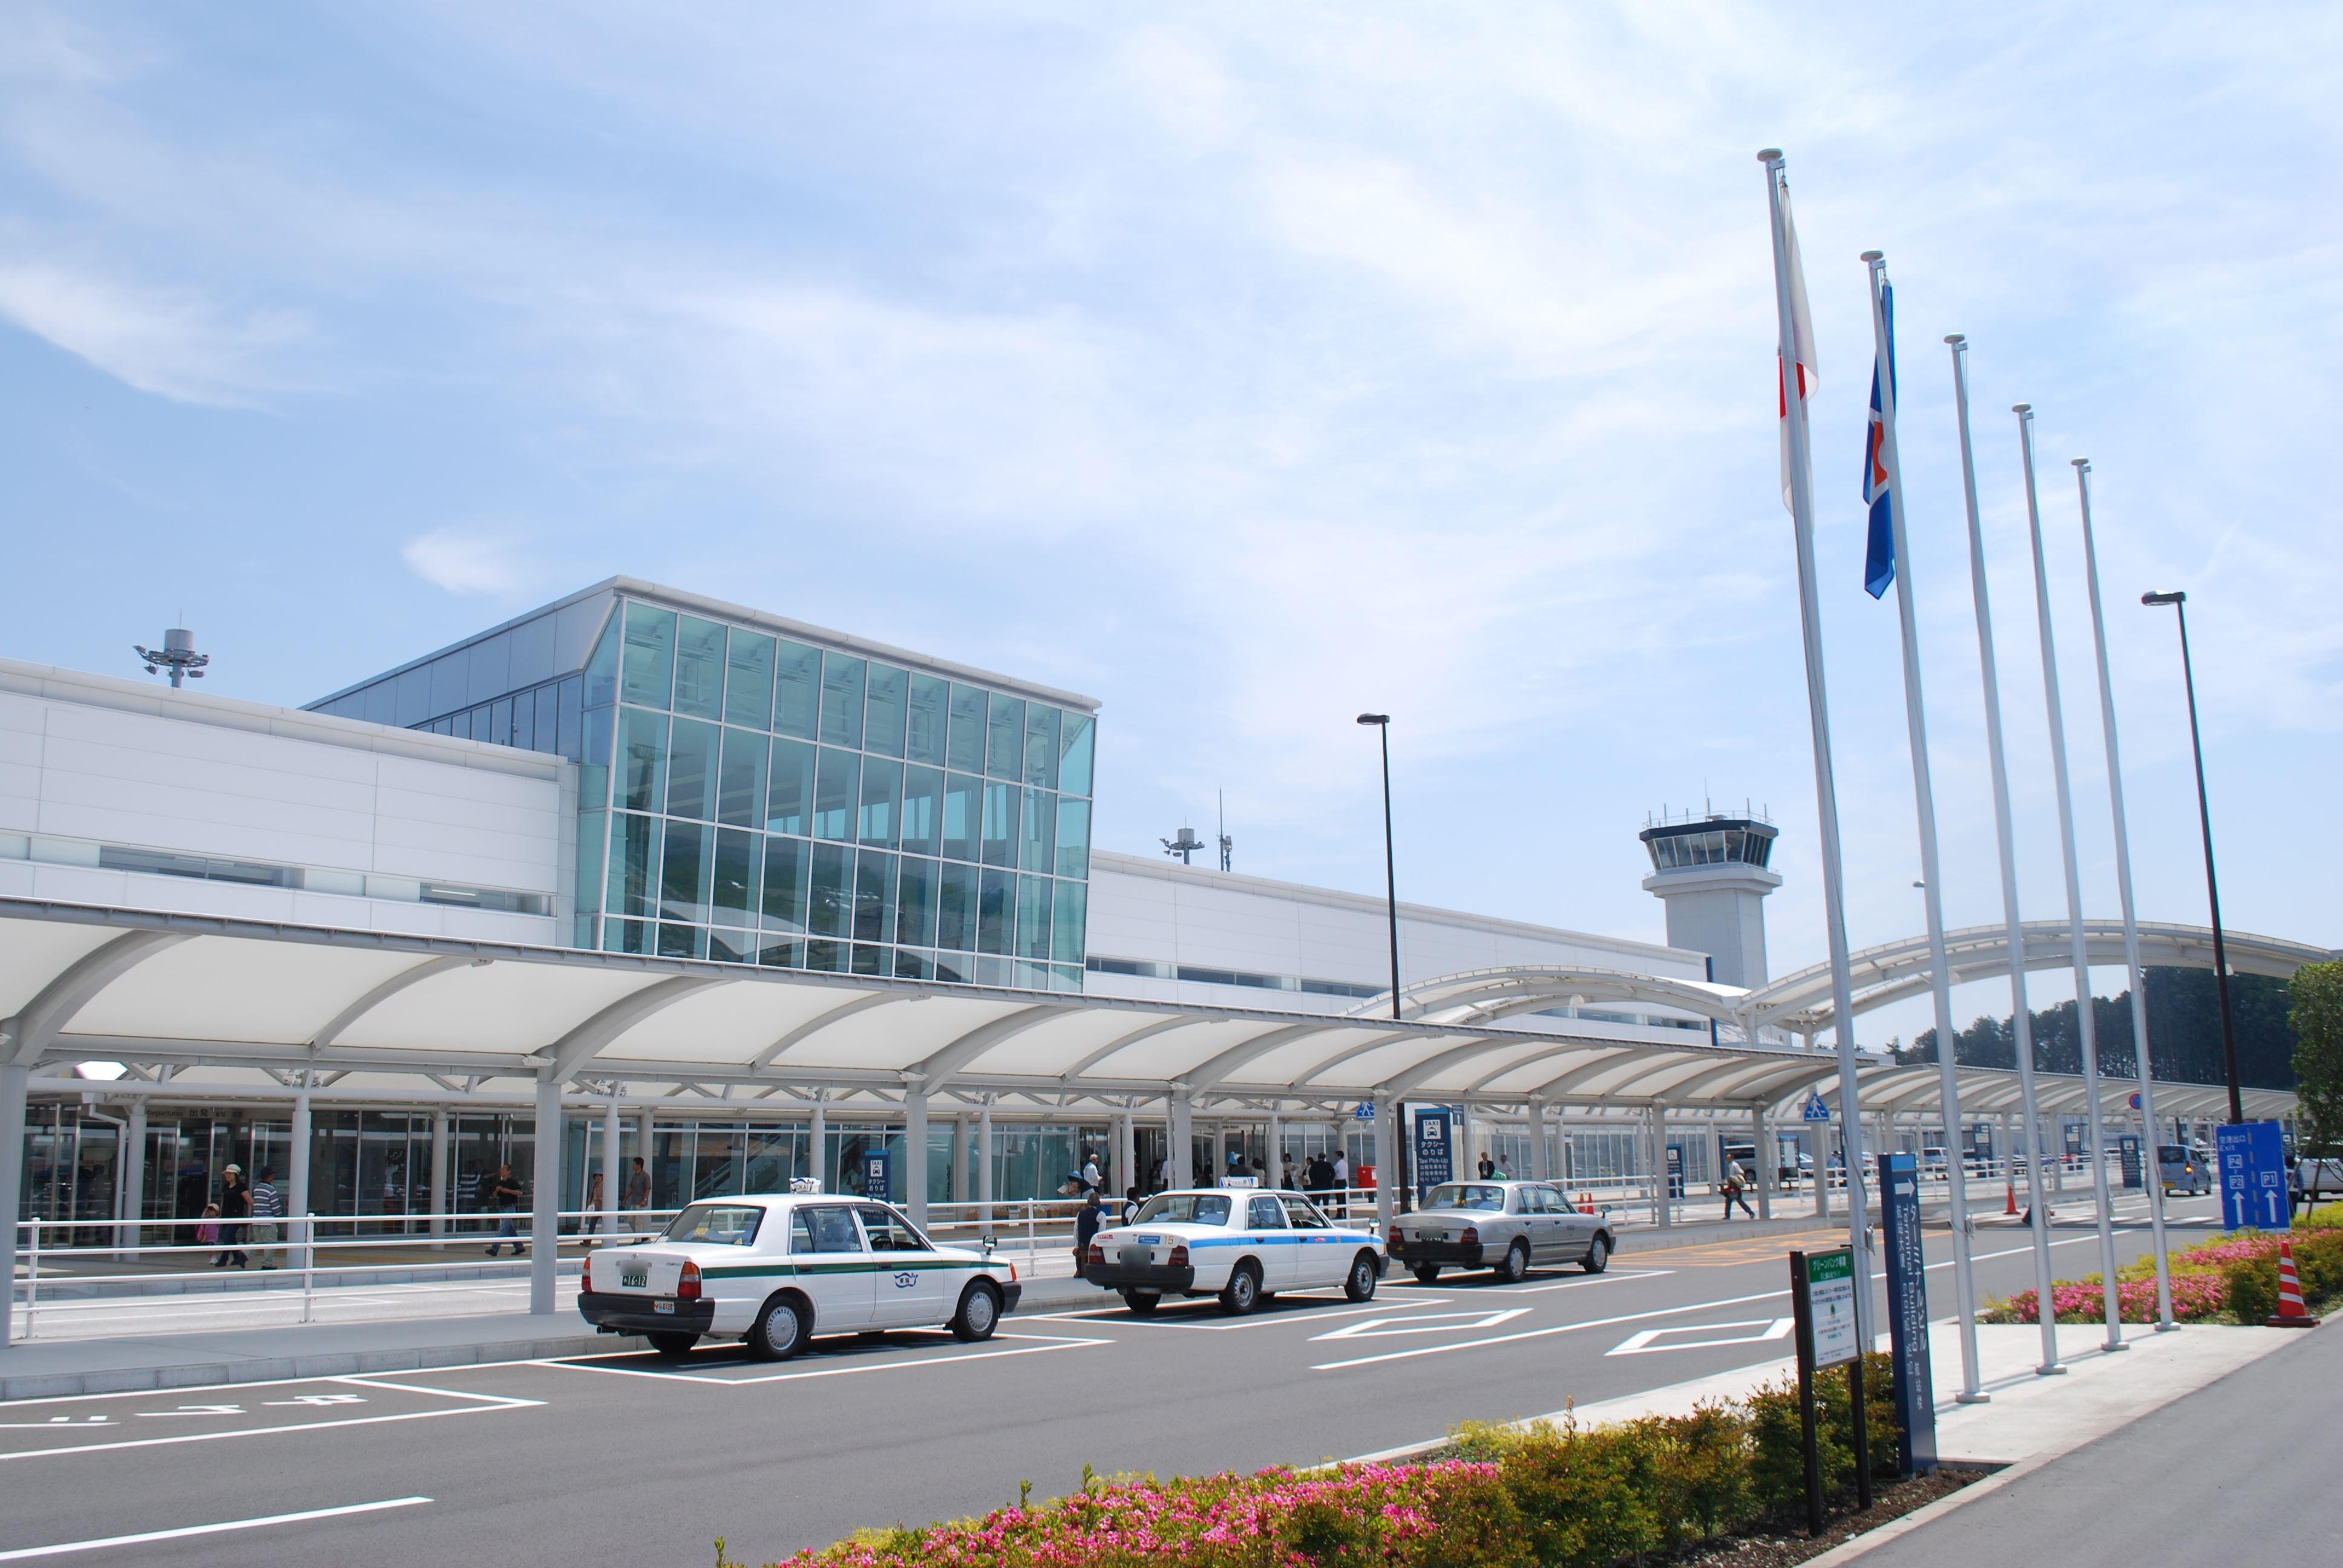 Shizuoka Japan  city photos gallery : Description Fujisan Shizuoka airport,Makinohara city,Japan